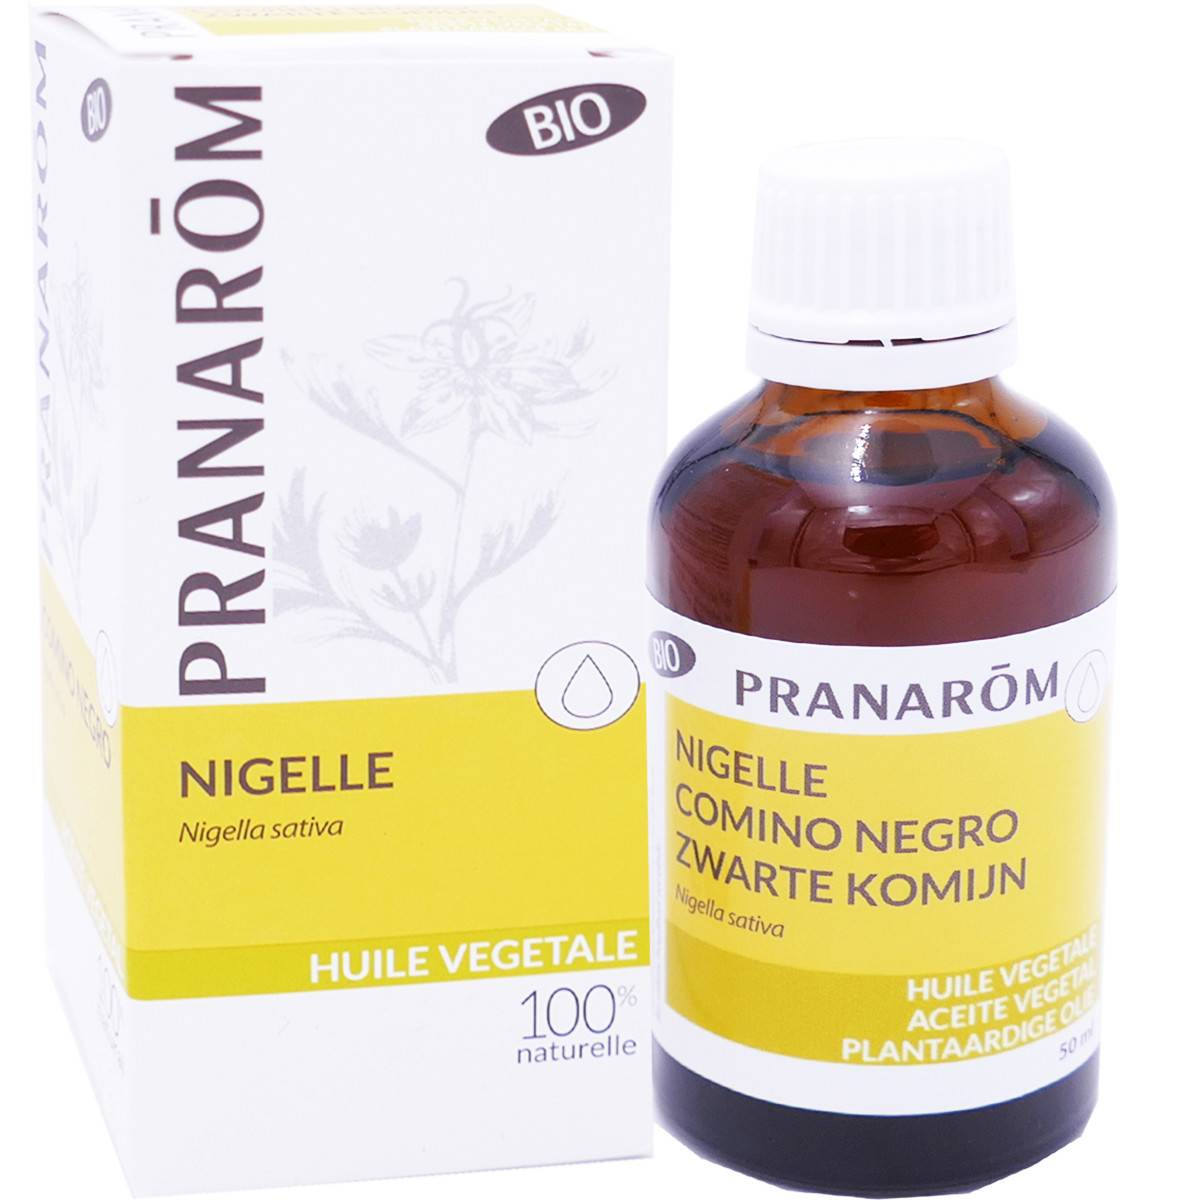 Pranarom huile vegetale bio nigelle 50 ml